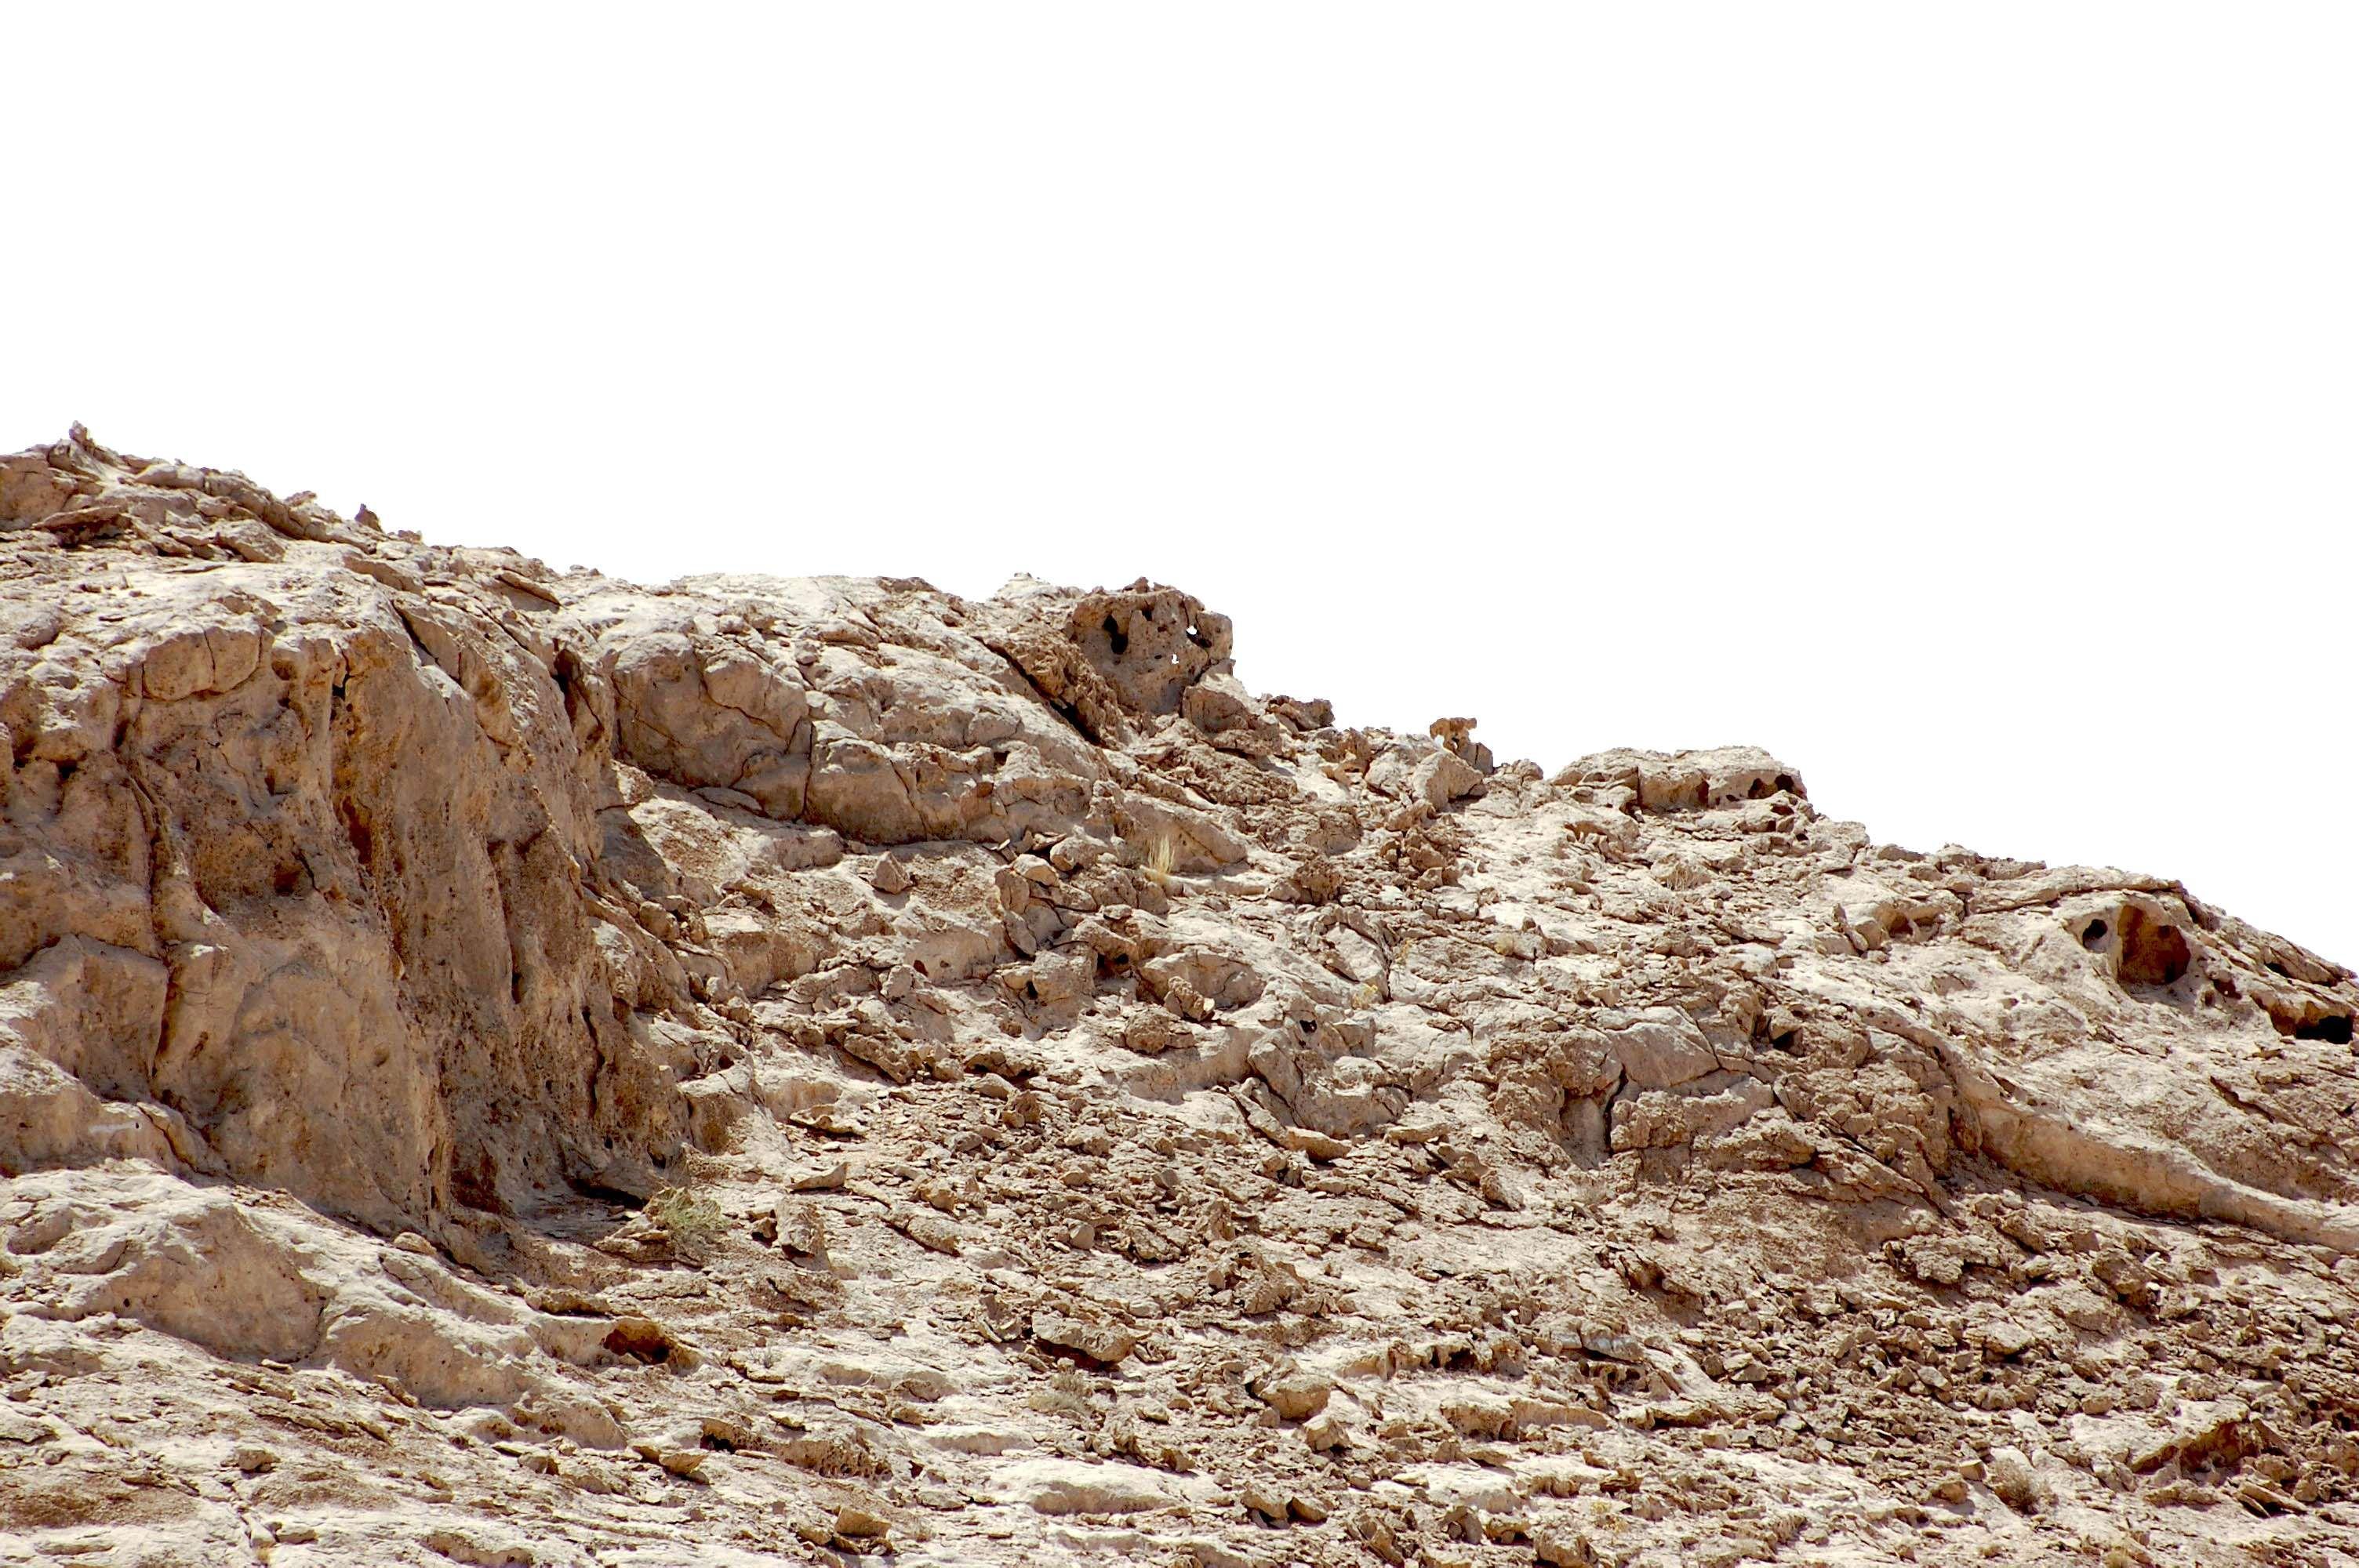 #landscape #mountain #nature #outdoor #png #rocks #rough #stones